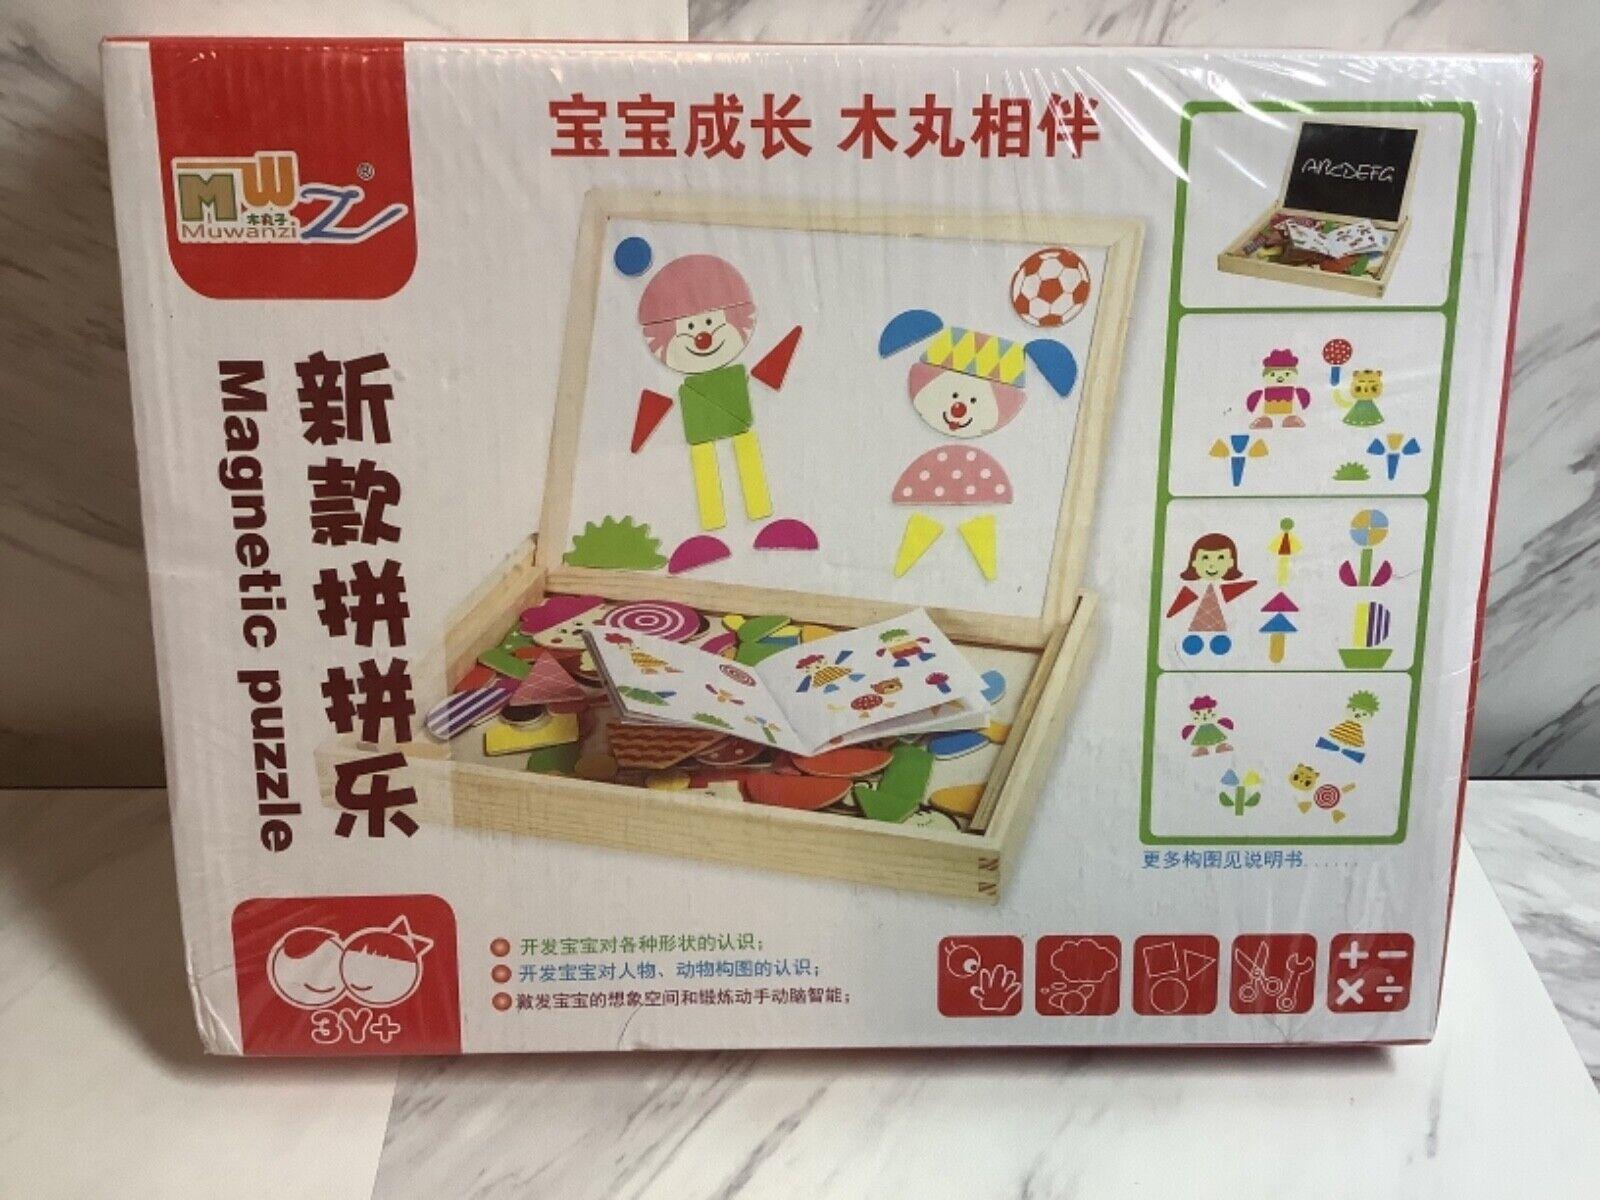 Fantastic Learning Education Magnetic Wooden Puzzle- Muwanzi - $19.97